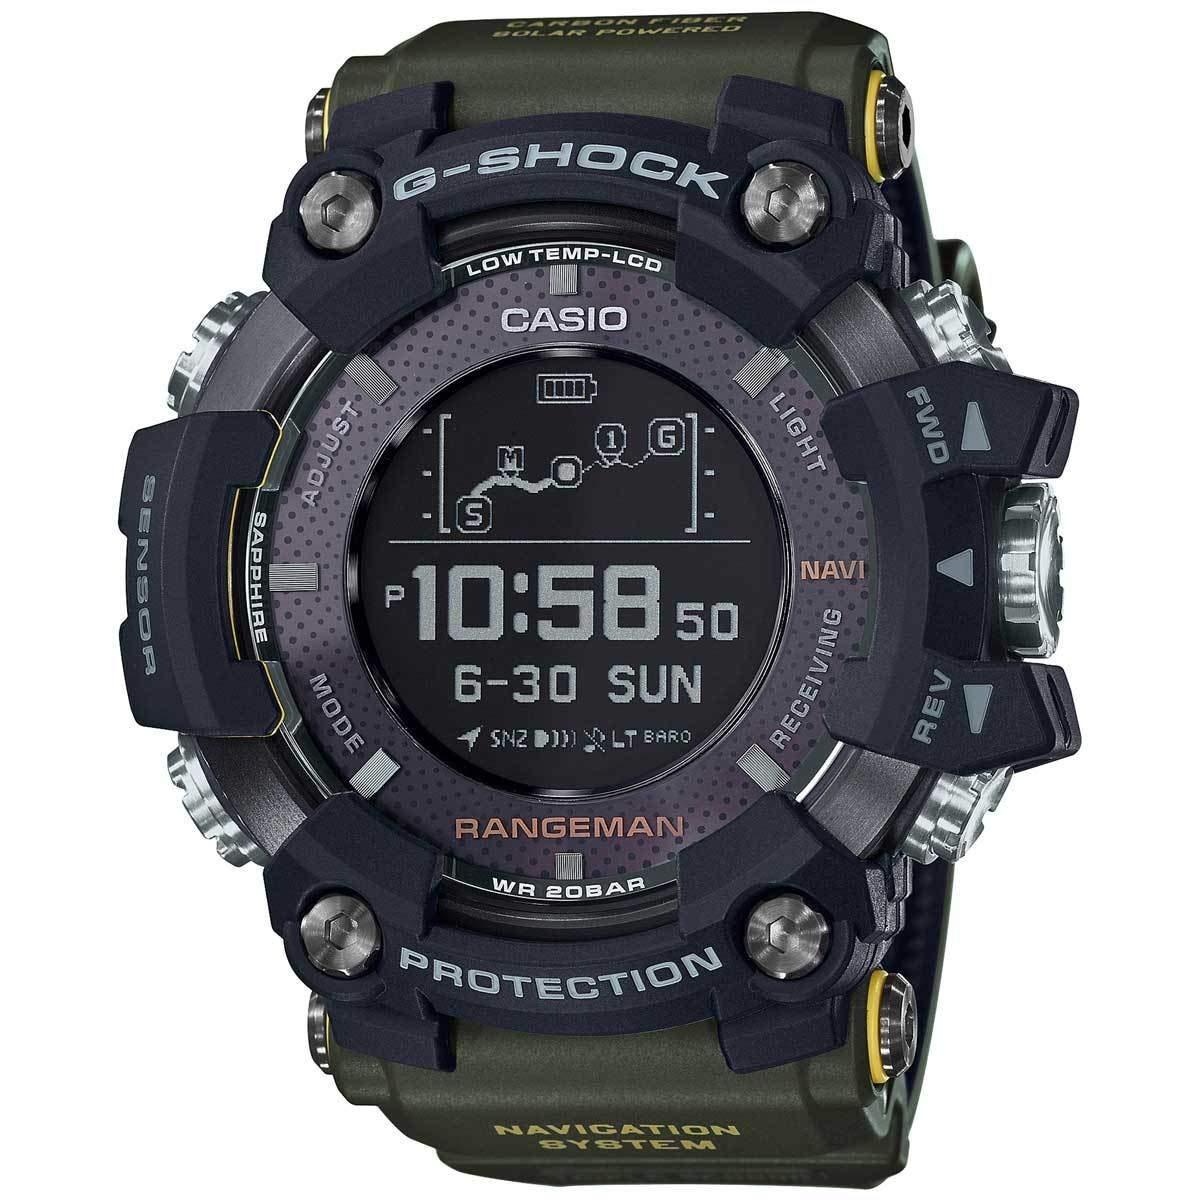 Casio G-SHOCK GPR-B1000-1B Rangeman